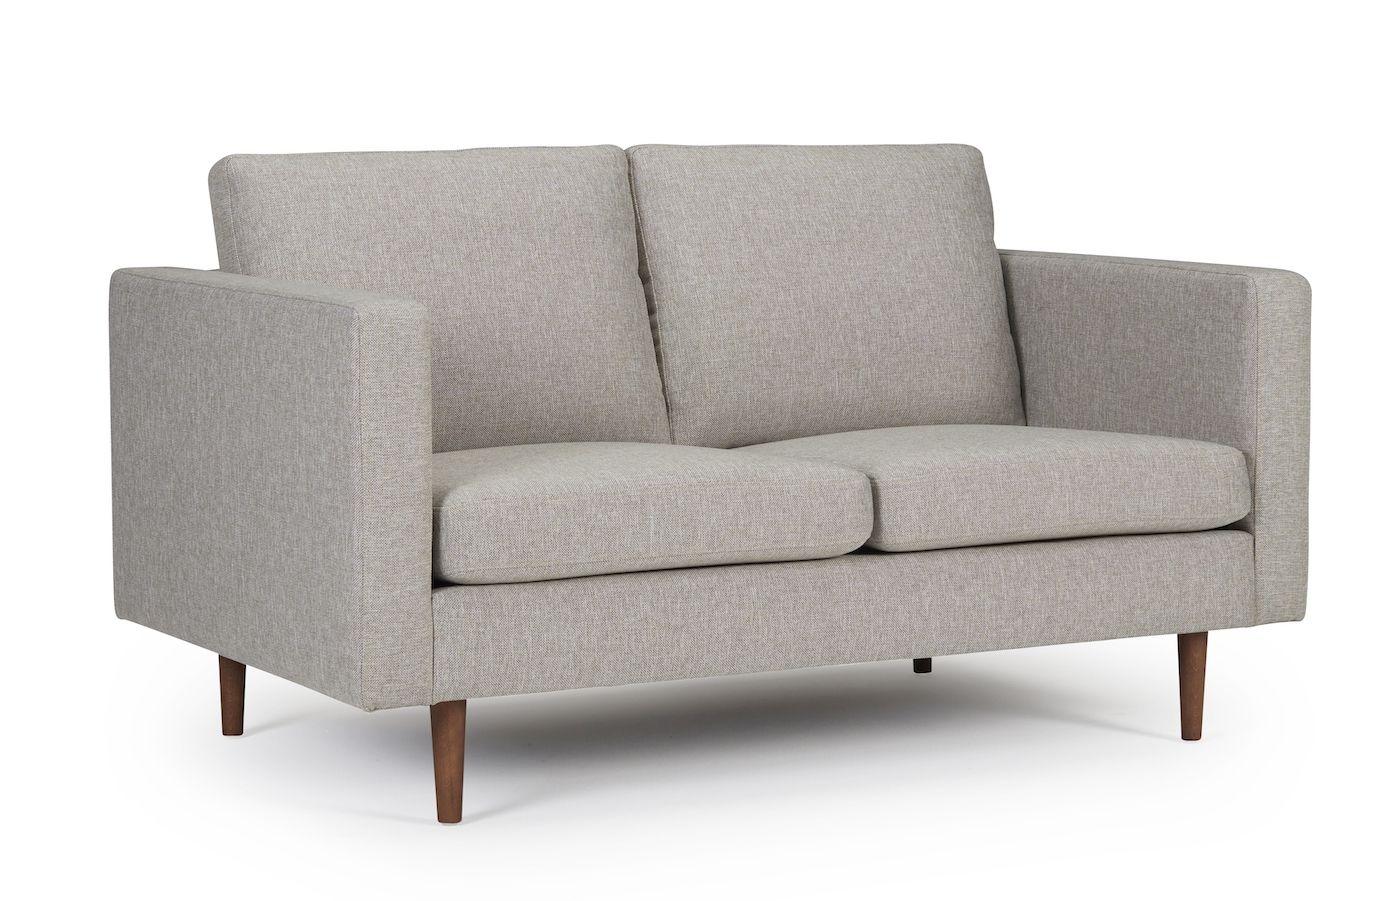 Kragelund Obling 2-pers. Sofa, Sand